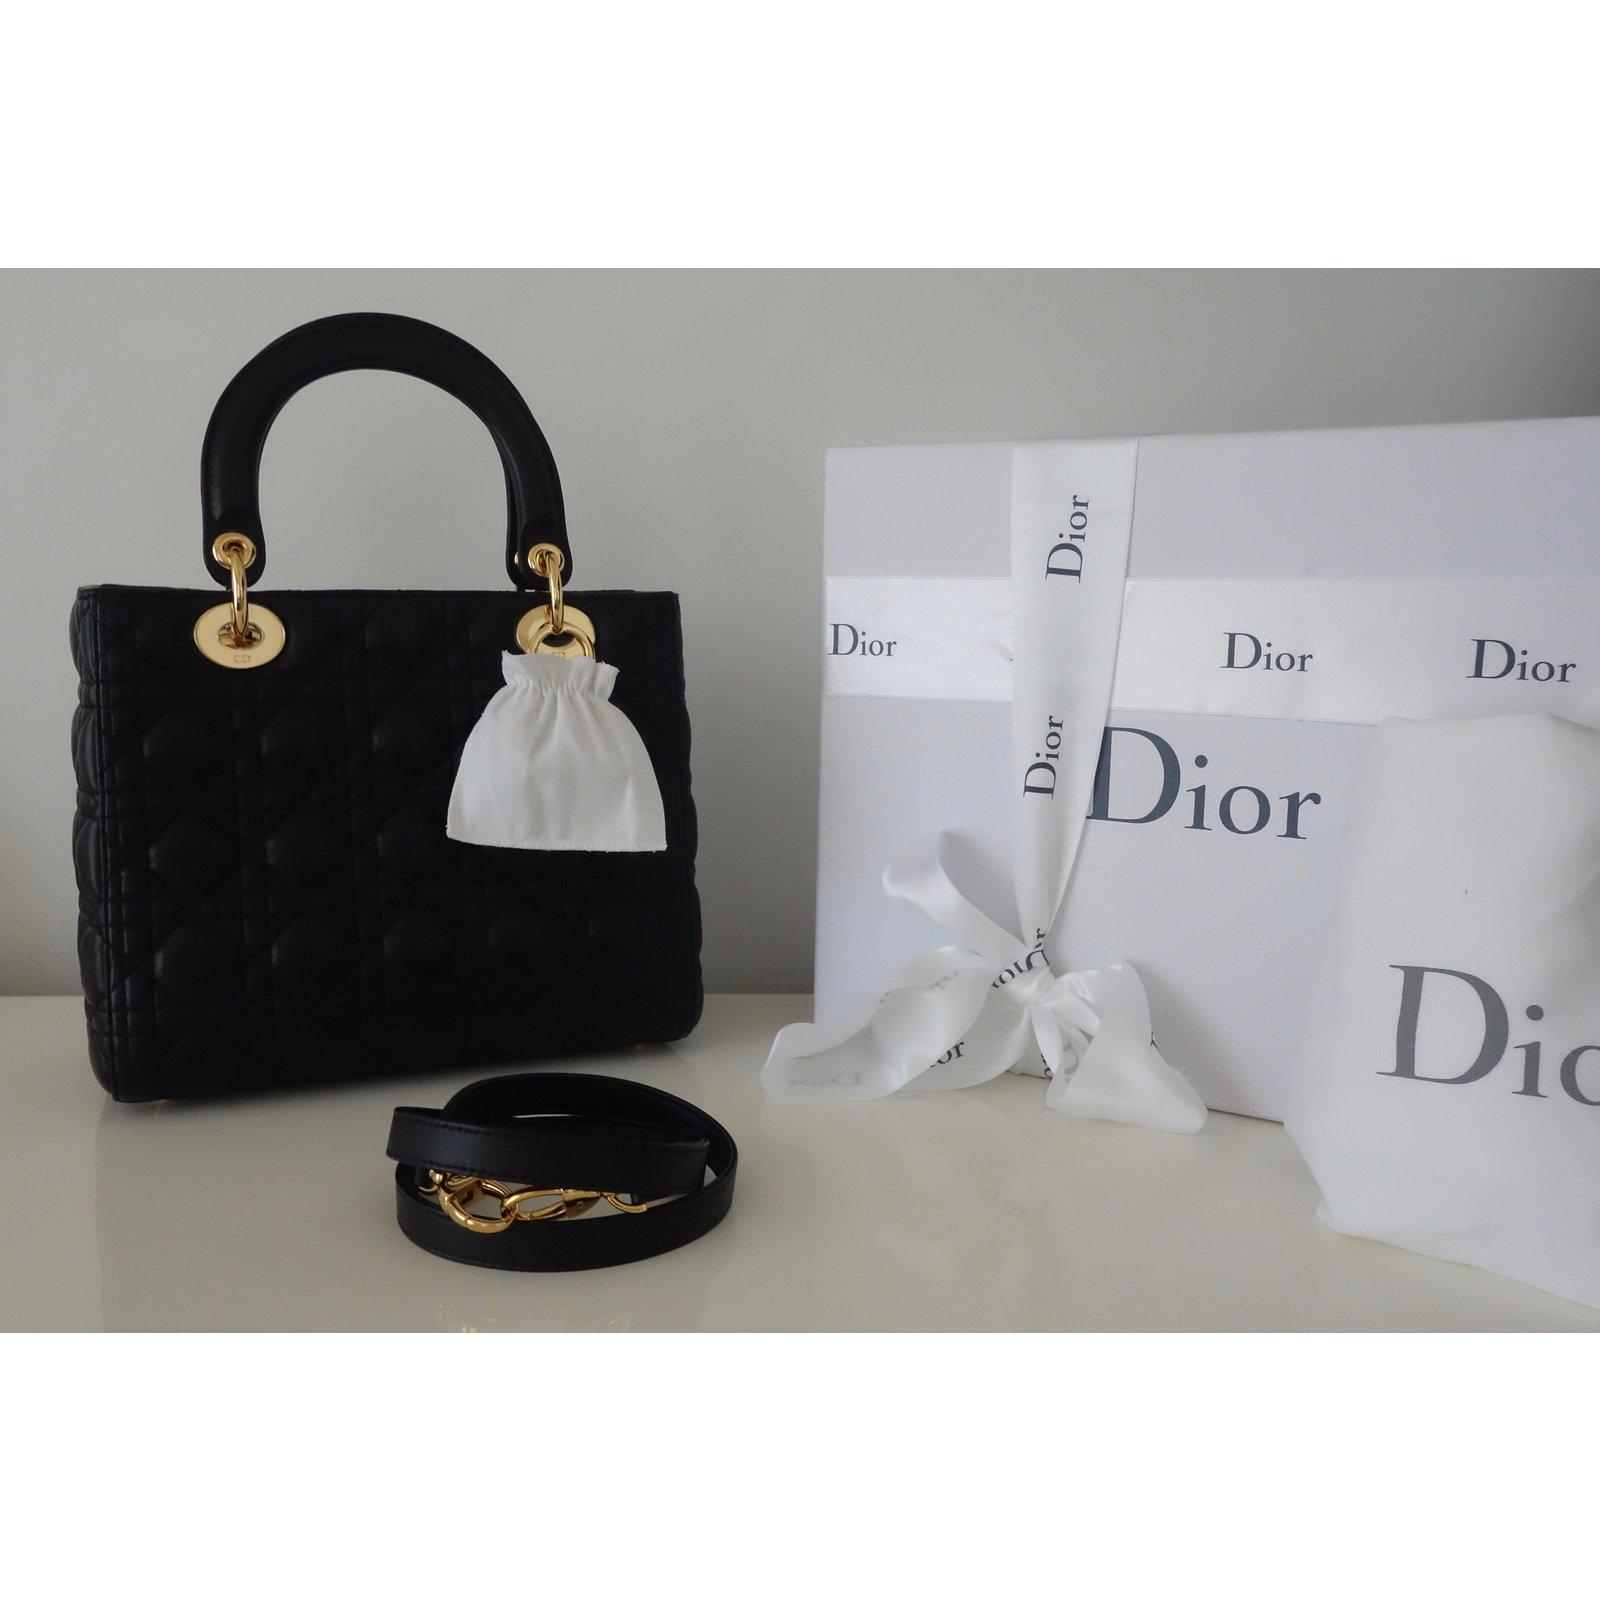 56cd5ef9b4 Sacs à main Christian Dior SAC LADY DIOR NOIR MEDIUM Cuir Noir ref.44821 -  Joli Closet